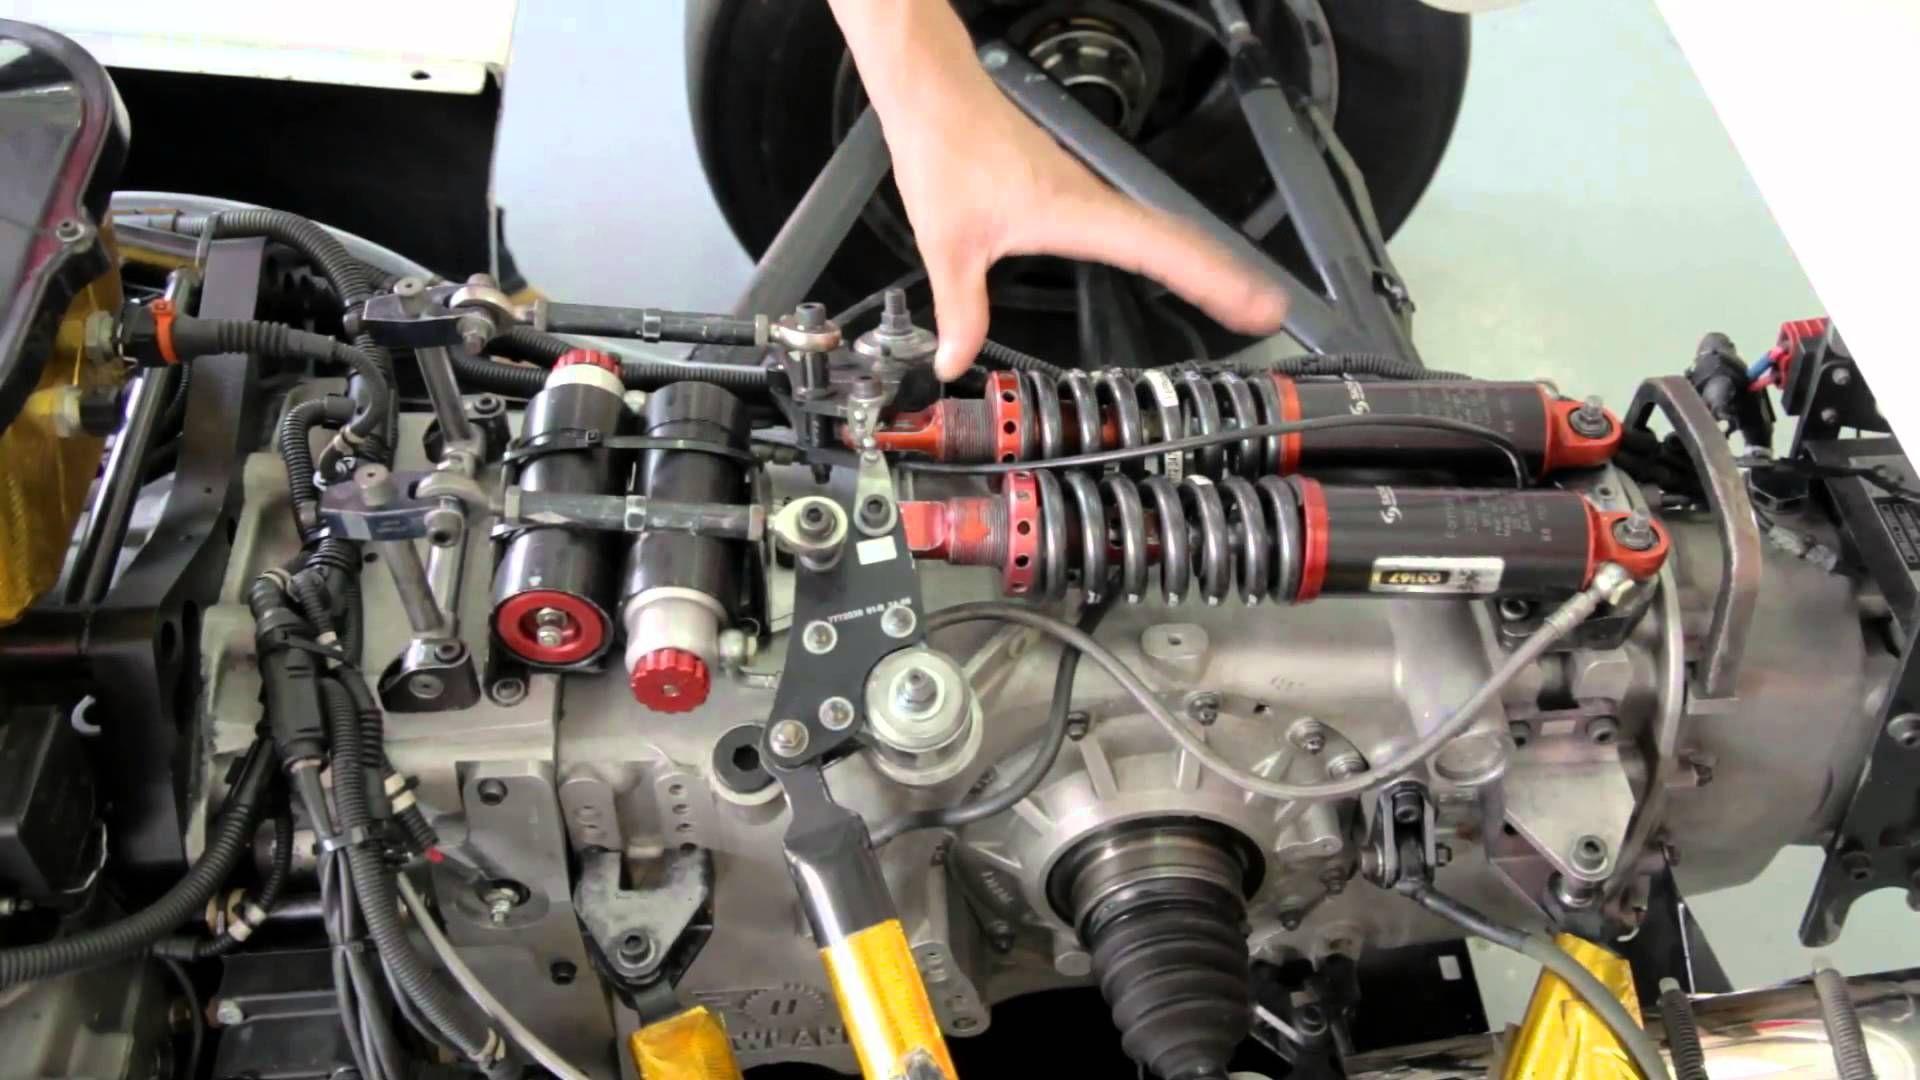 ASIA CUP SERIES - ENGINEERS OF RACING - SUSPENSION - IS